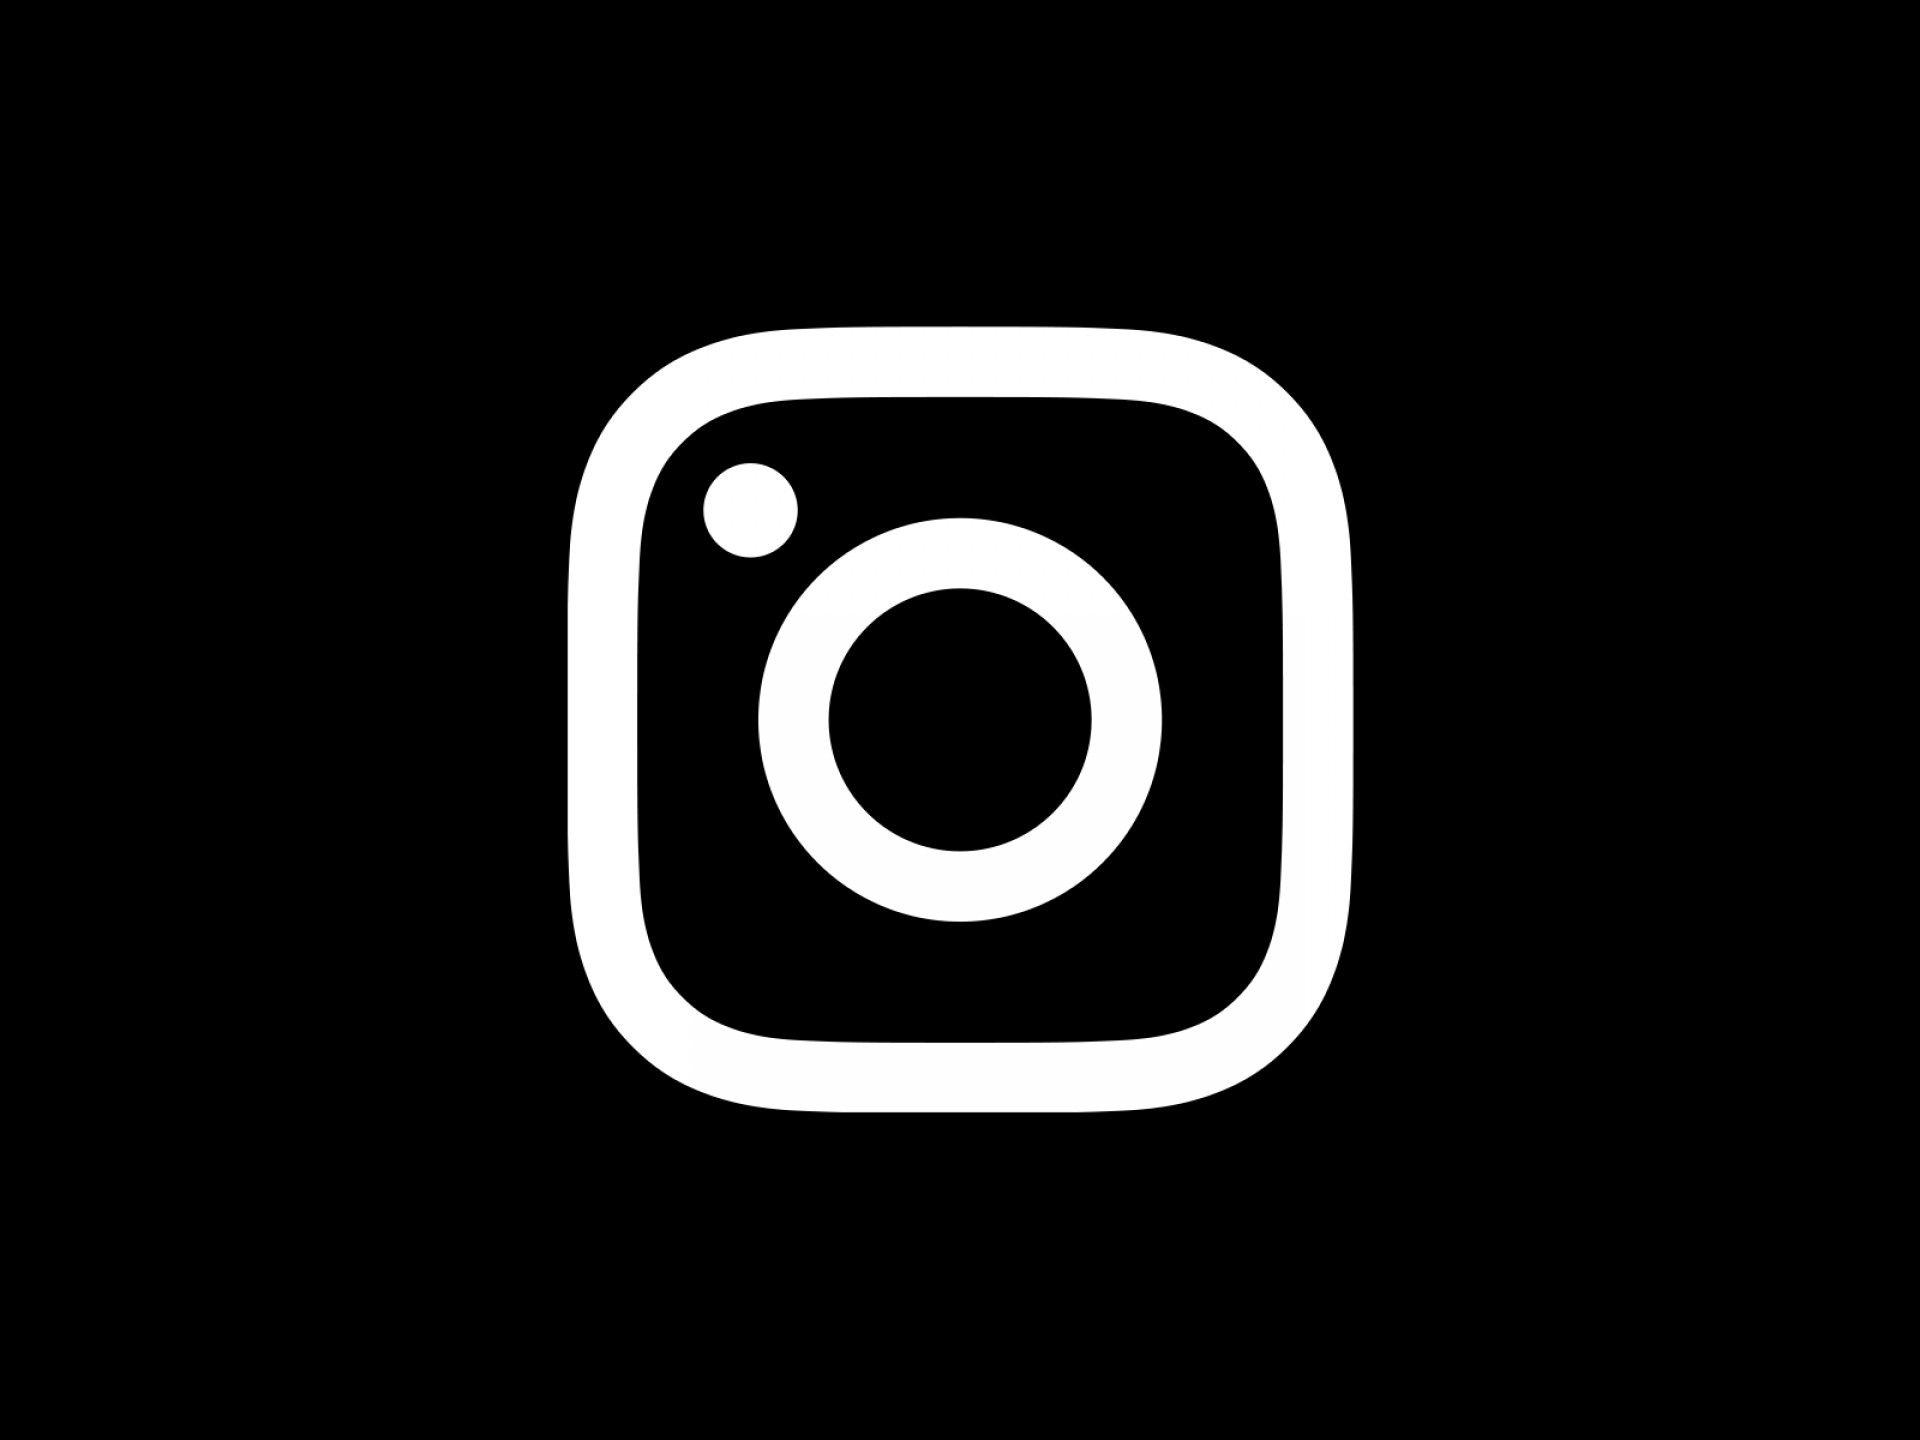 Instagram Logo Vector Icons Free Download | SOIDERGI ...